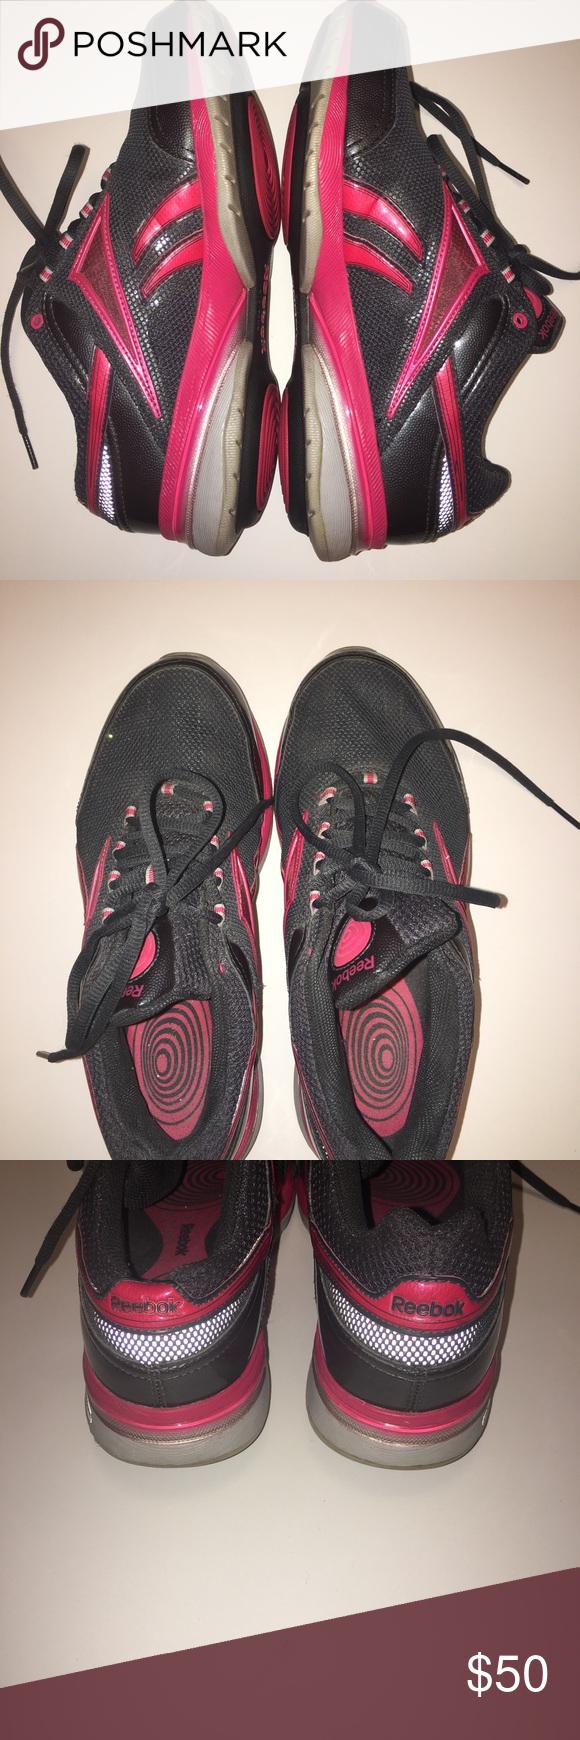 estómago Letrista helicóptero  Reebok smoothfit traintone running sneakers. | Running sneakers, Reebok,  Reebok shoes